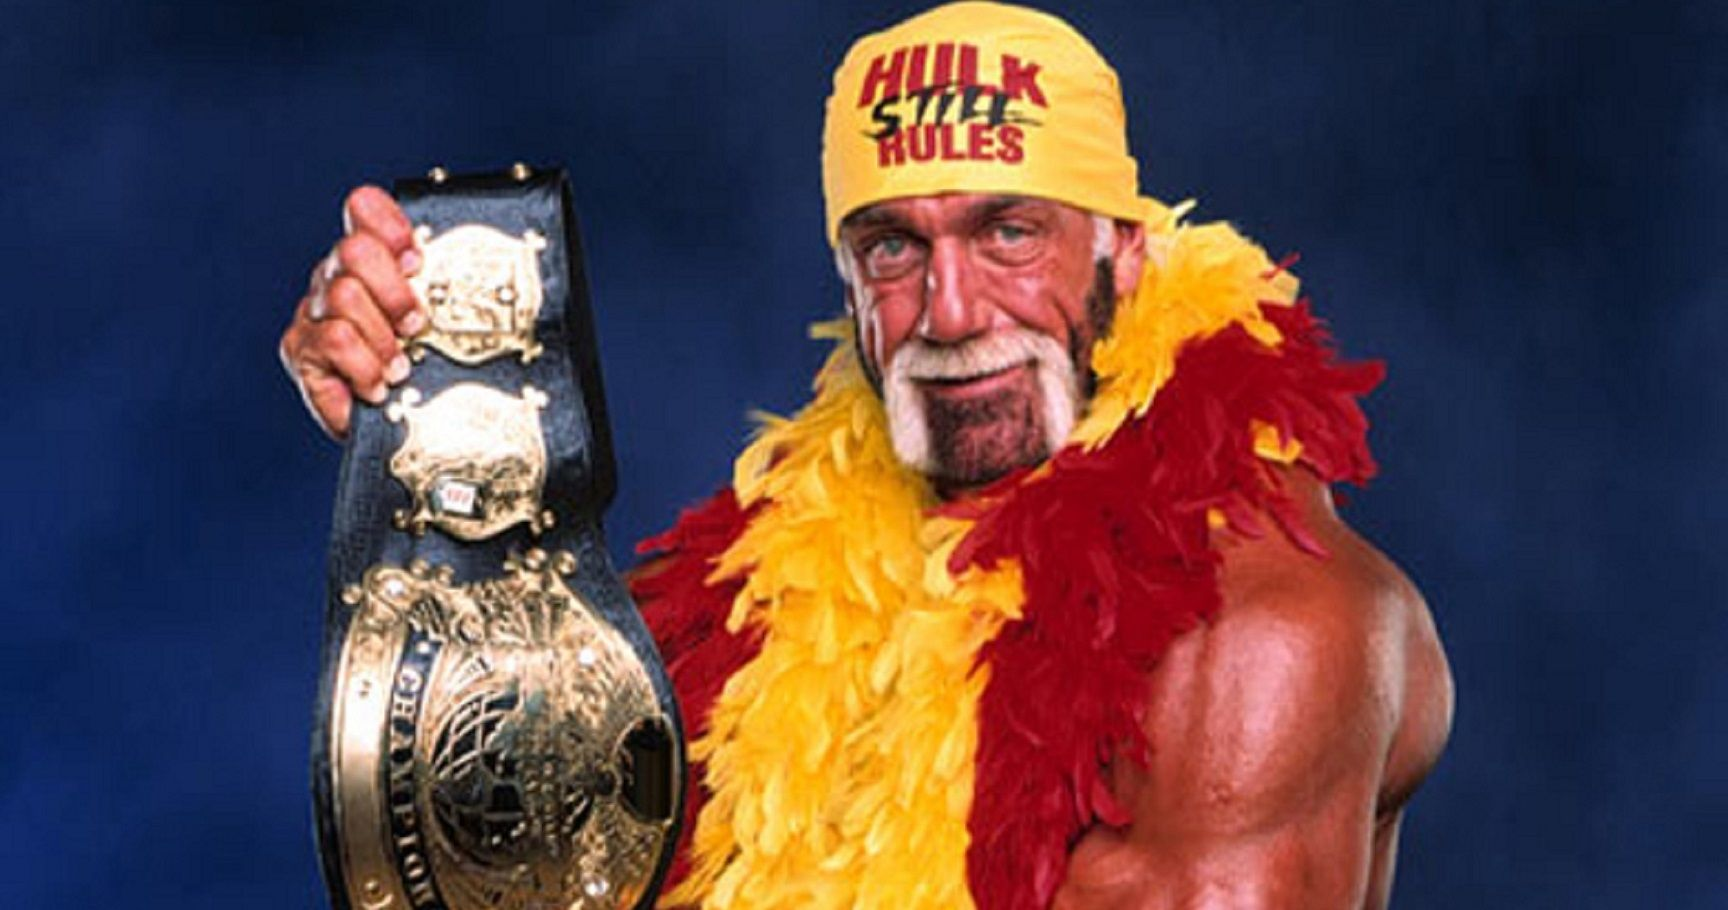 Hulk hogan wins-3643